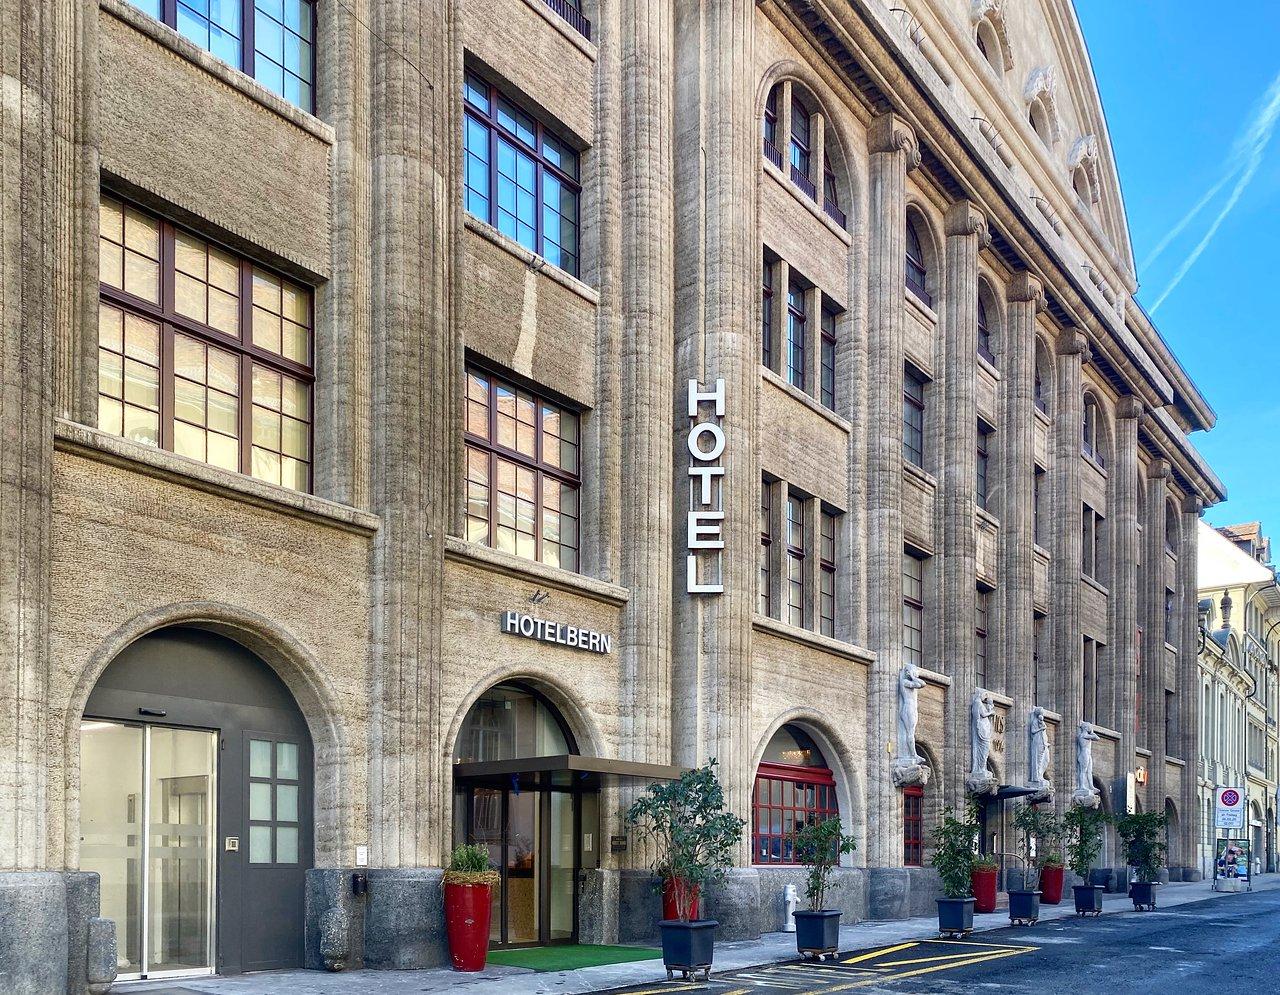 Best Western Plus Hotel Bern 143 1 7 1 Prices Reviews Switzerland Tripadvisor